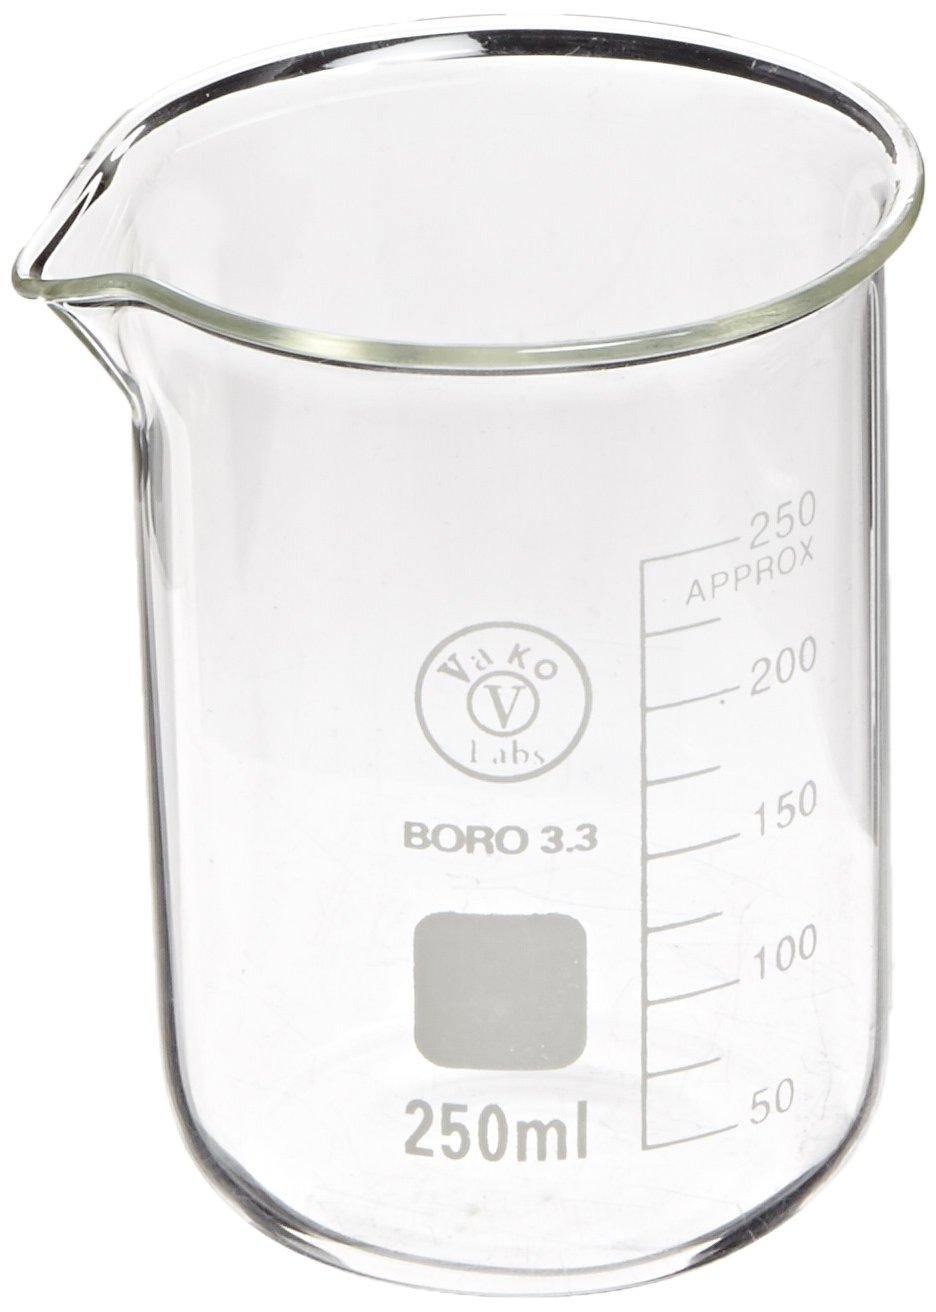 Ajax Scientific GL010-0250 Borosilicate Beaker Graduated Glass Some reservation online shopping